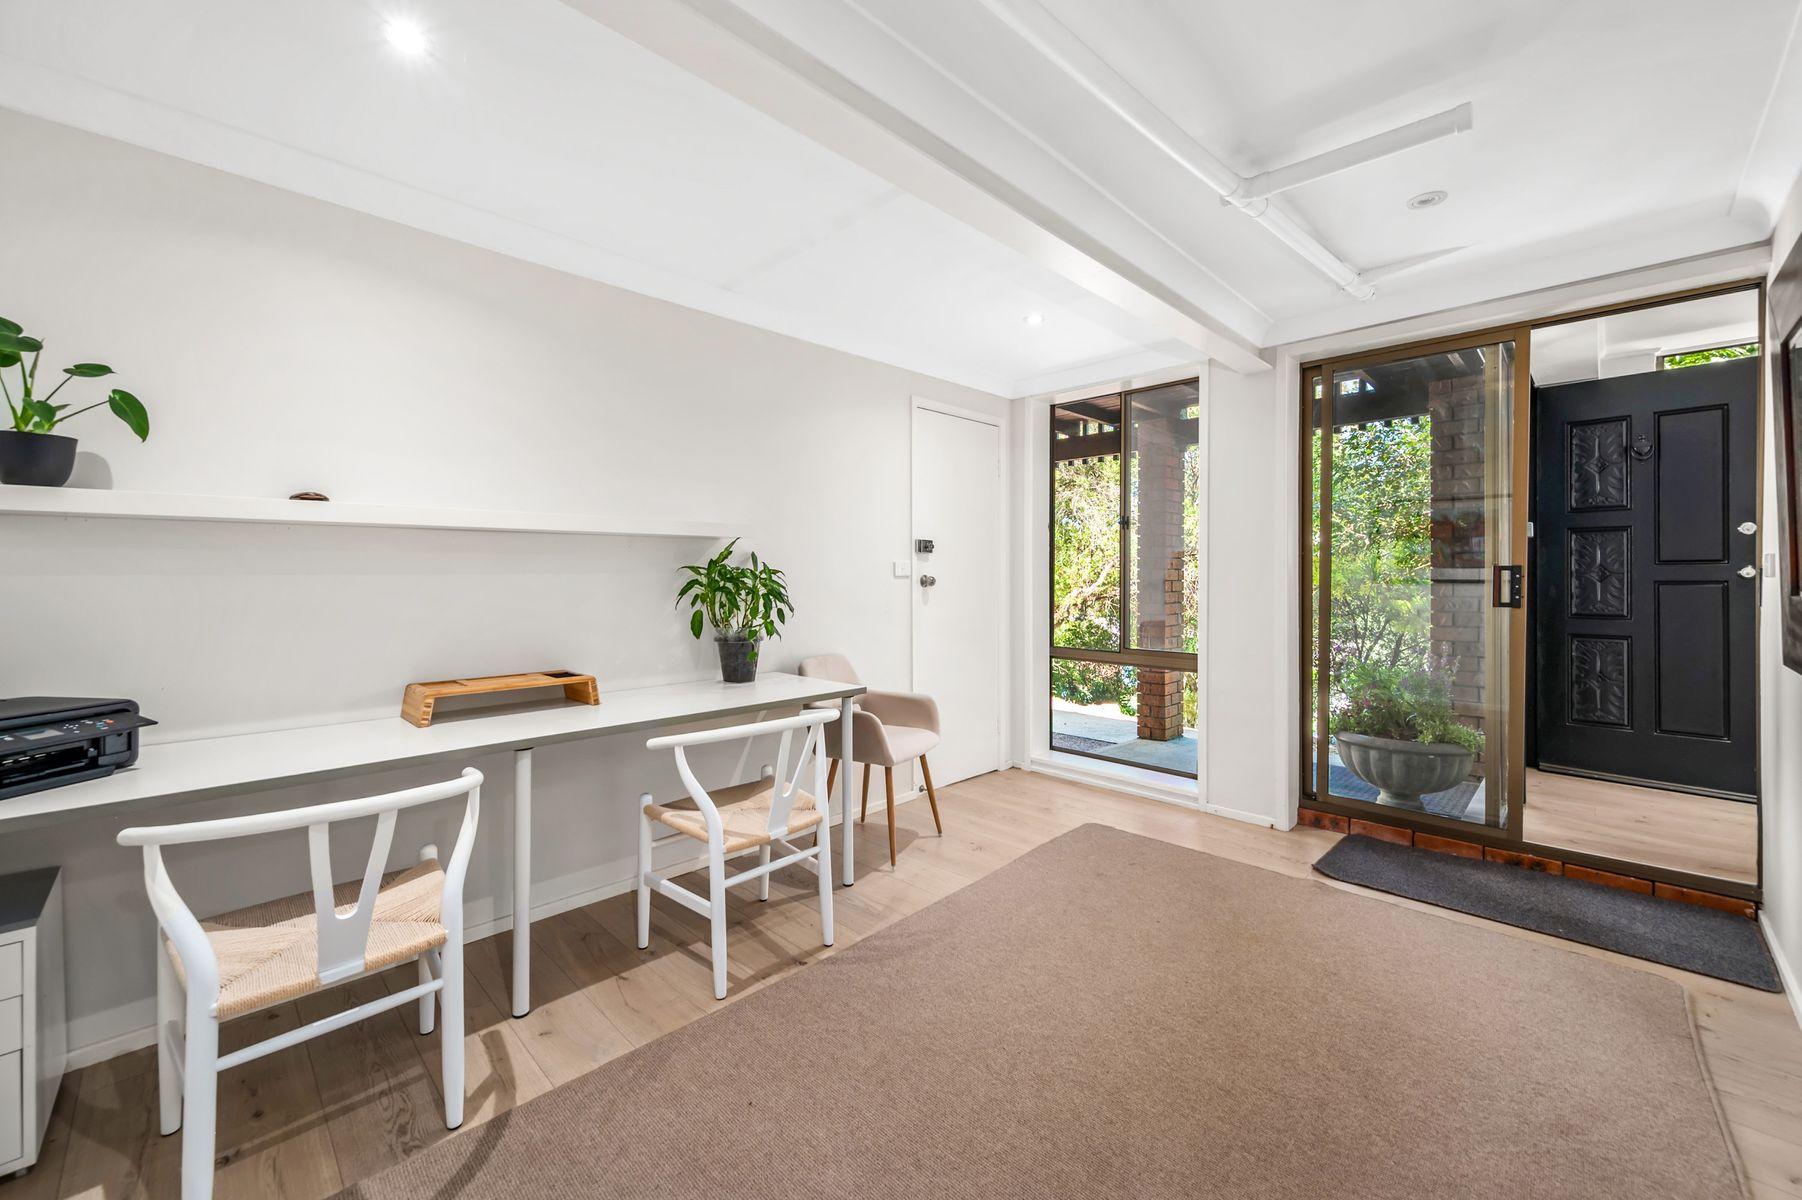 119 Graham Street, Glendale, NSW 2285